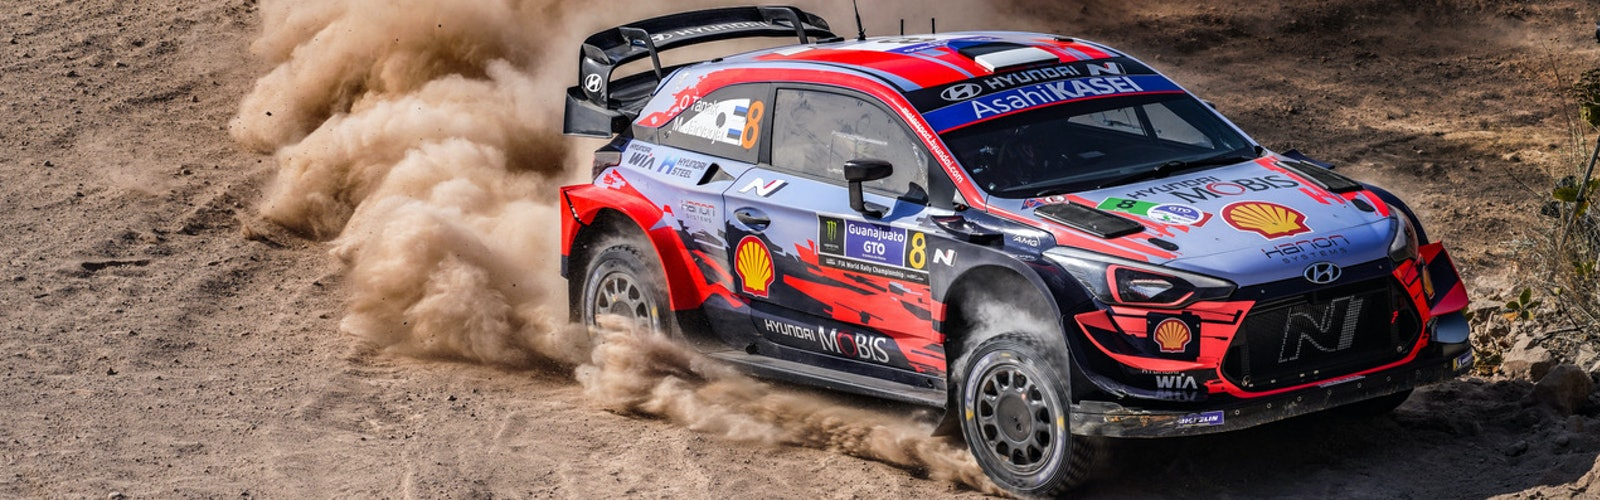 Tanak Hyundai WRC 2020